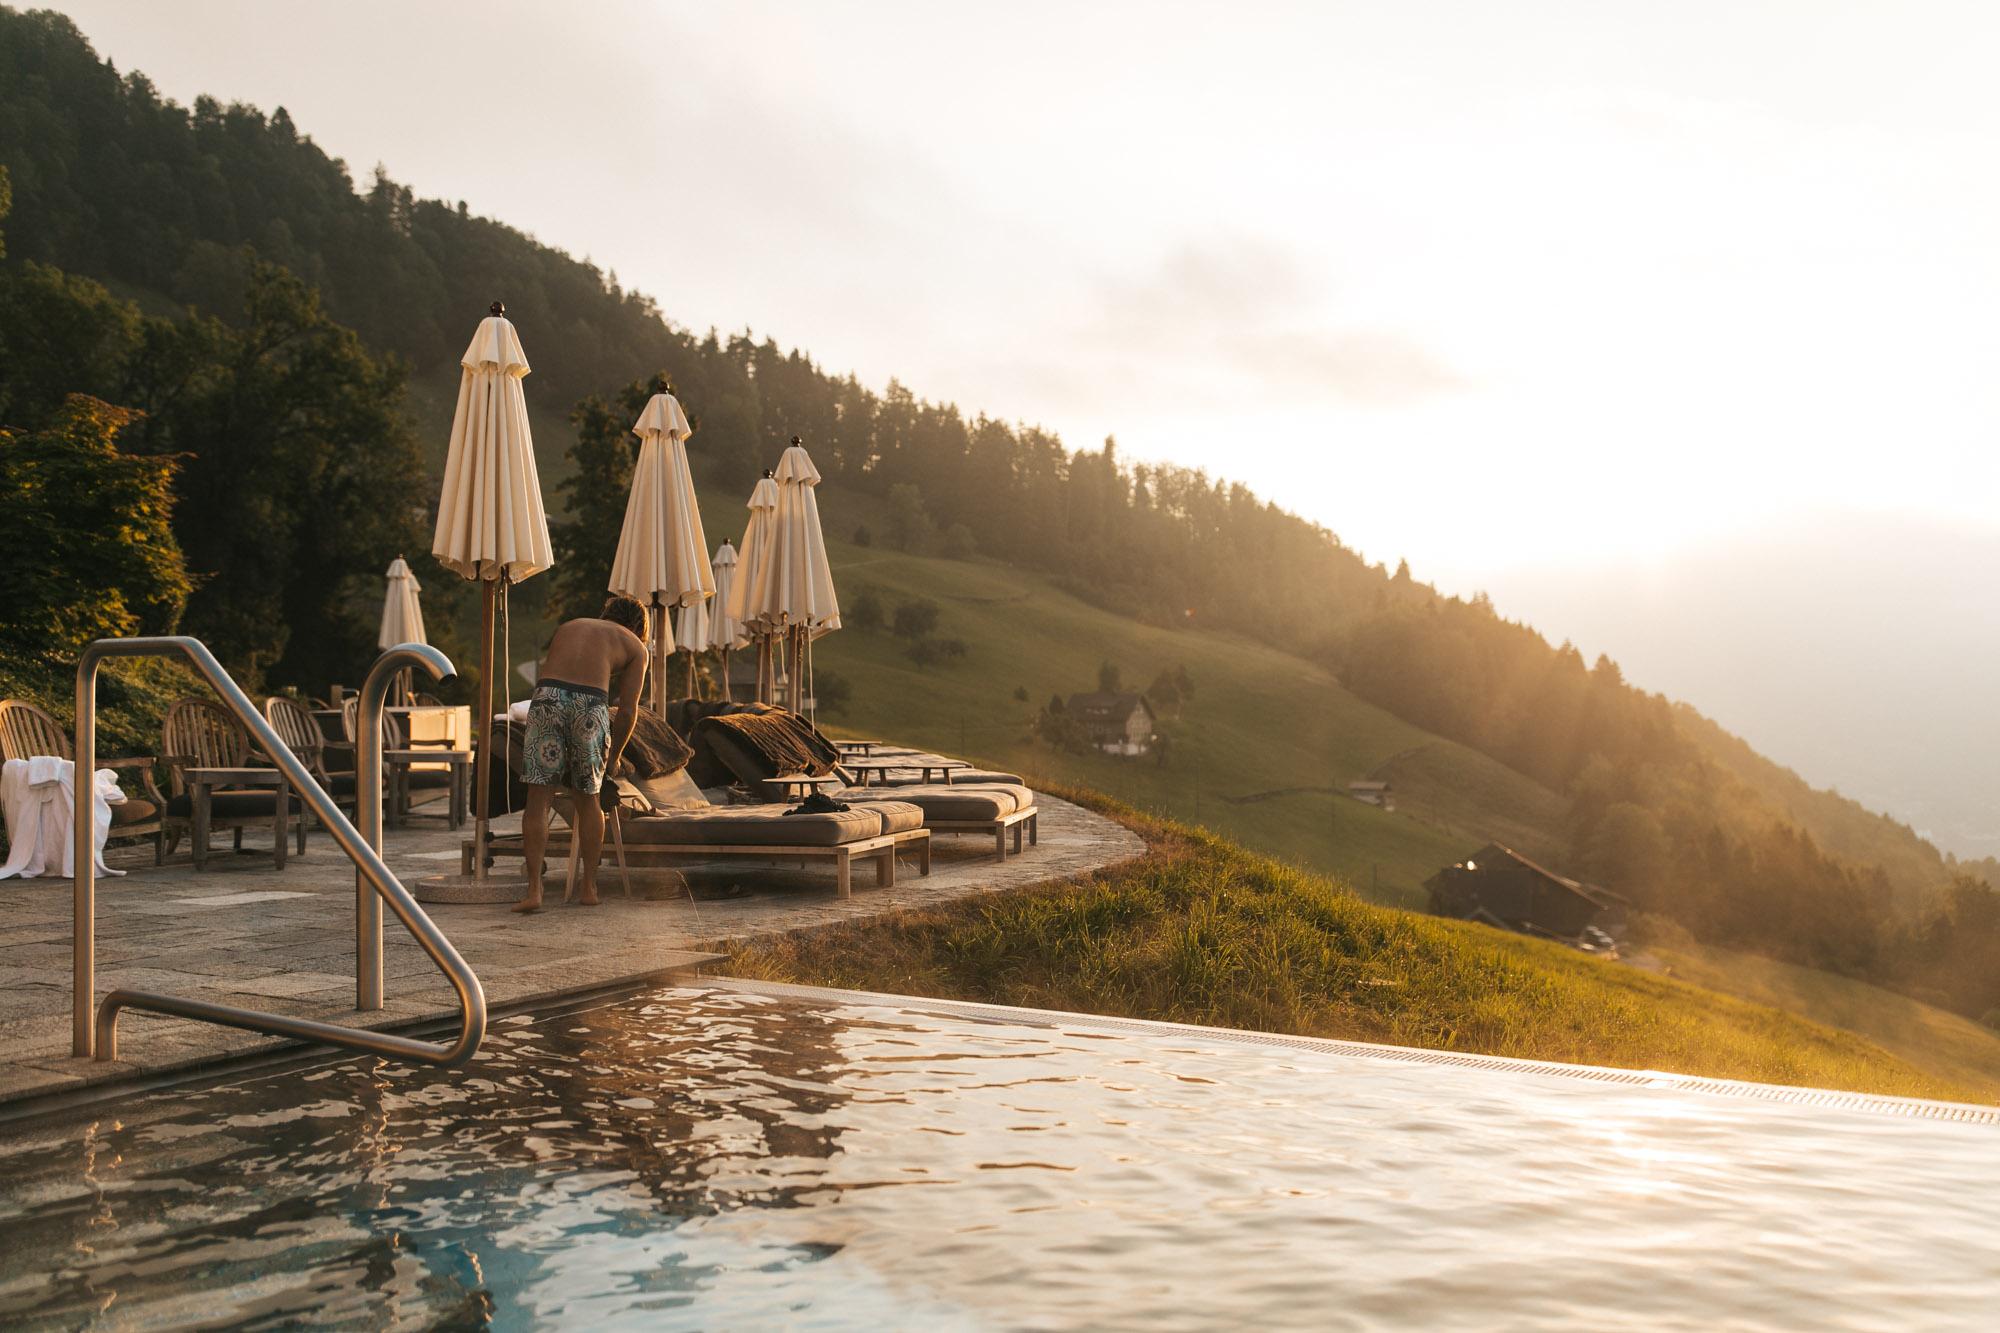 SwitzerlandBlog_HBGOODIE2018 (44 of 58).jpg